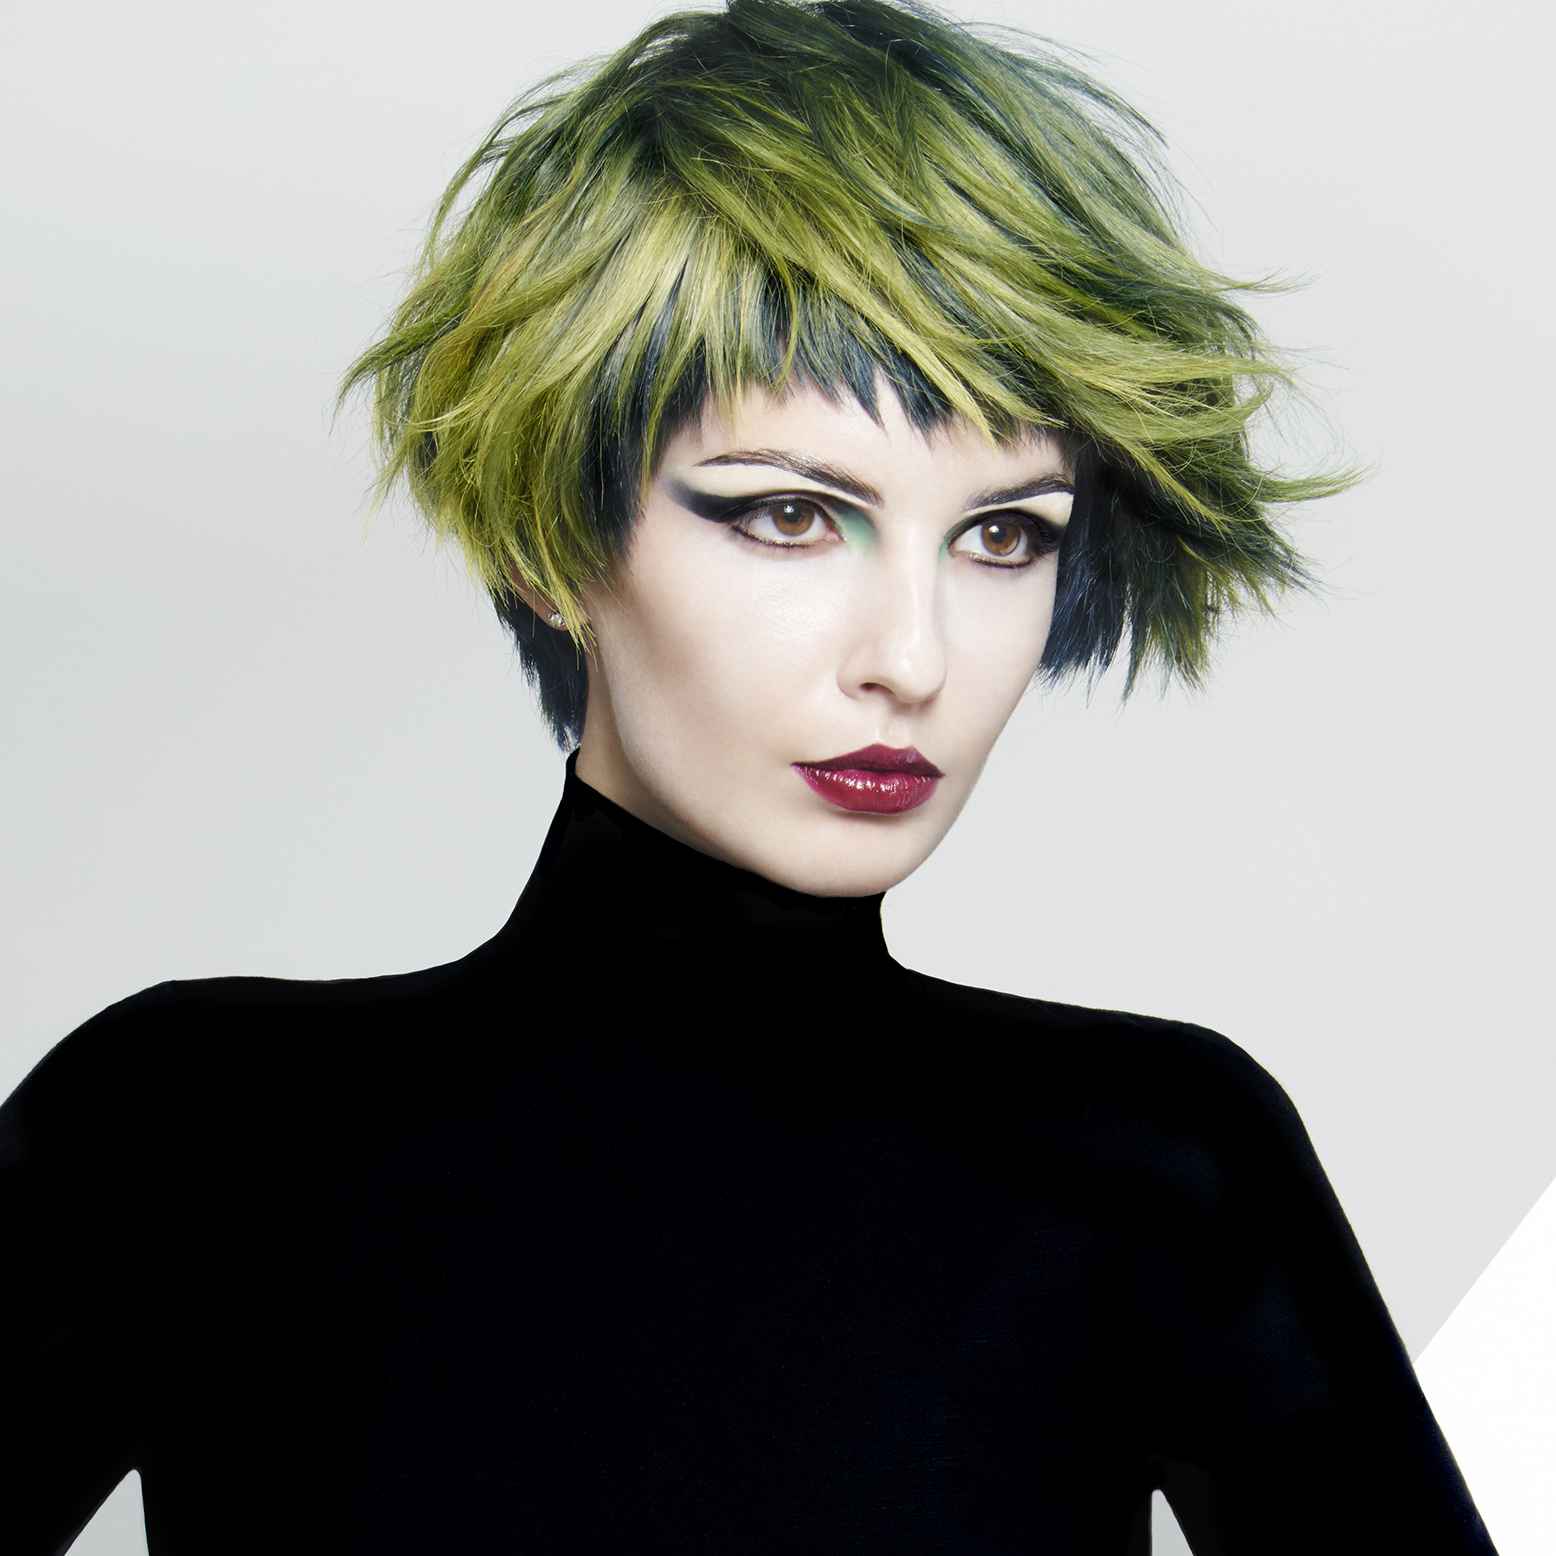 Green hair 2.jpg